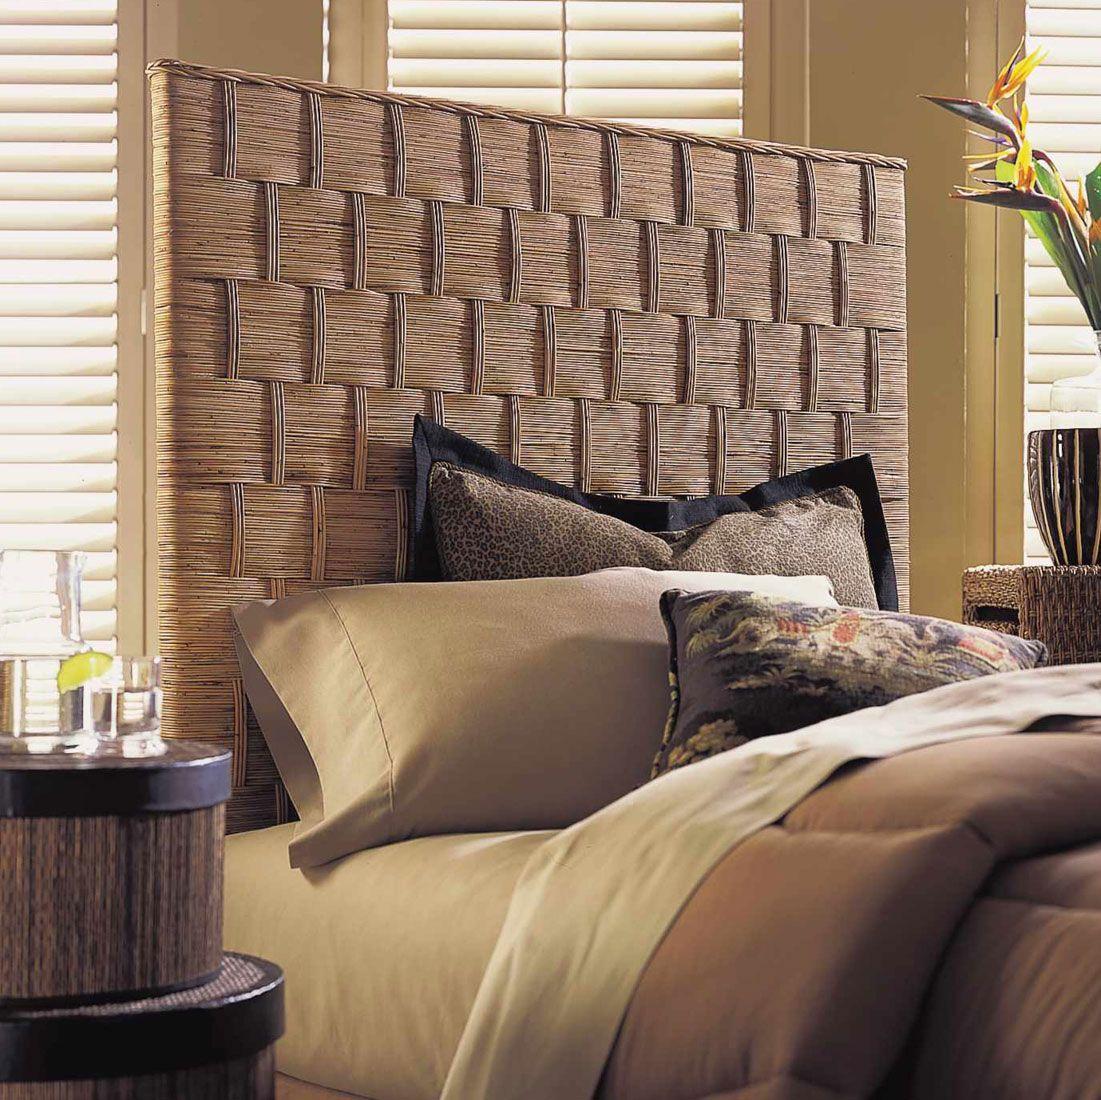 contemporary headboard ideas for your modern bedroom - Headboard Design Ideas